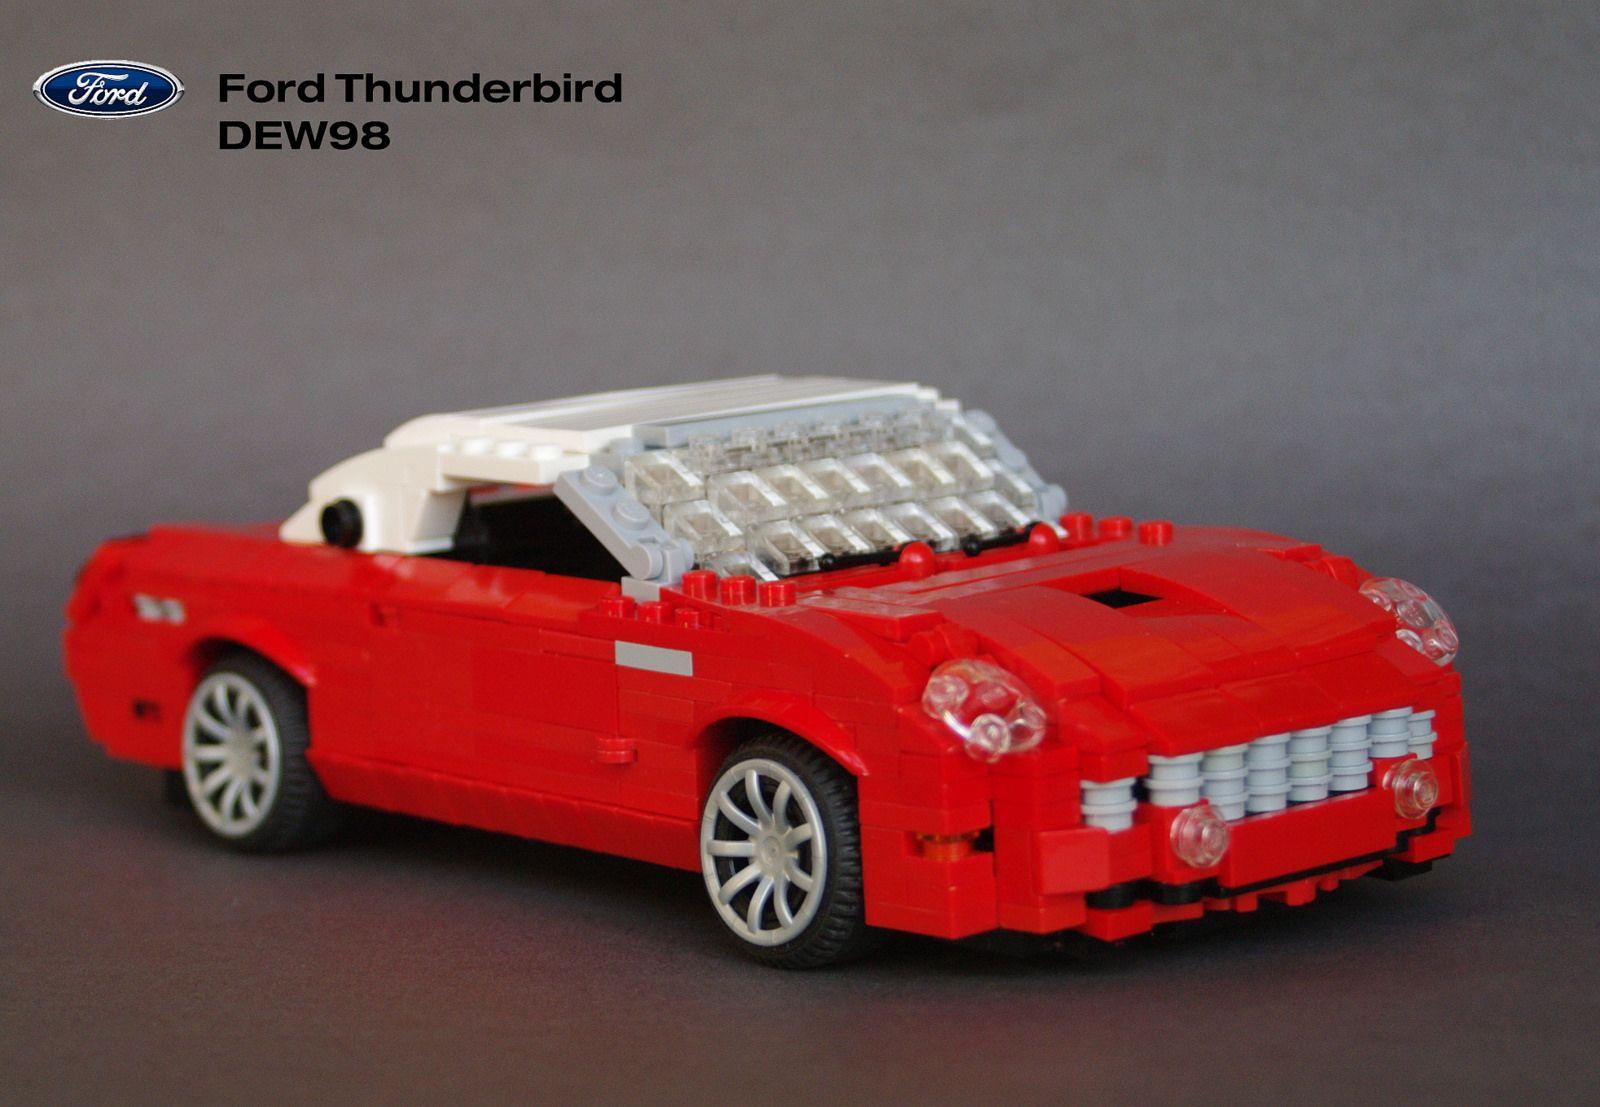 Ford Thunderbird 2002 (Eleventh Generation - DEW98)